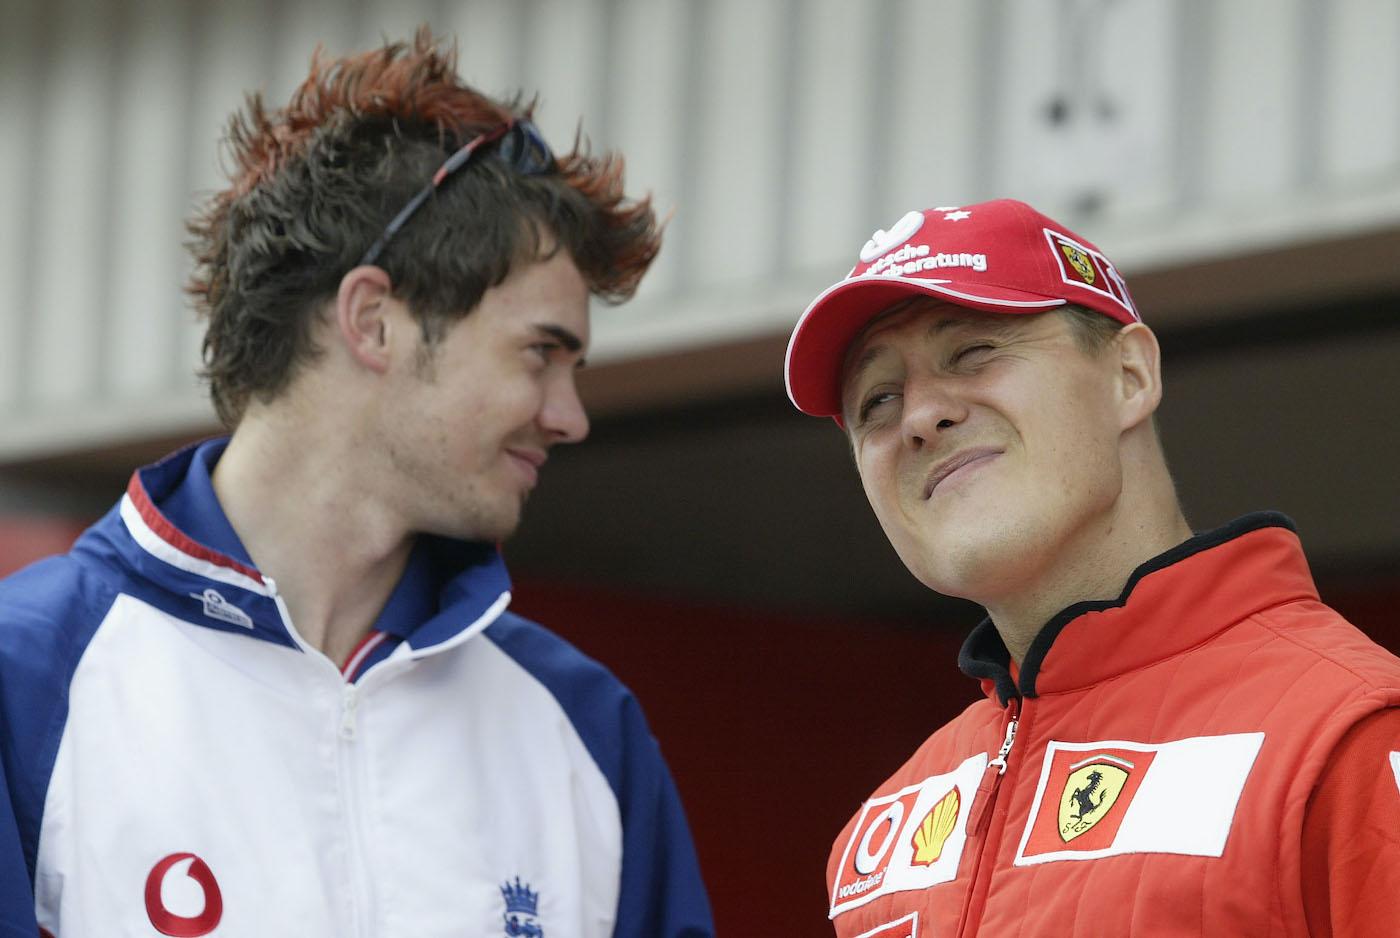 A racing stripe does not a speedster make, Michael Schumacher seems to say